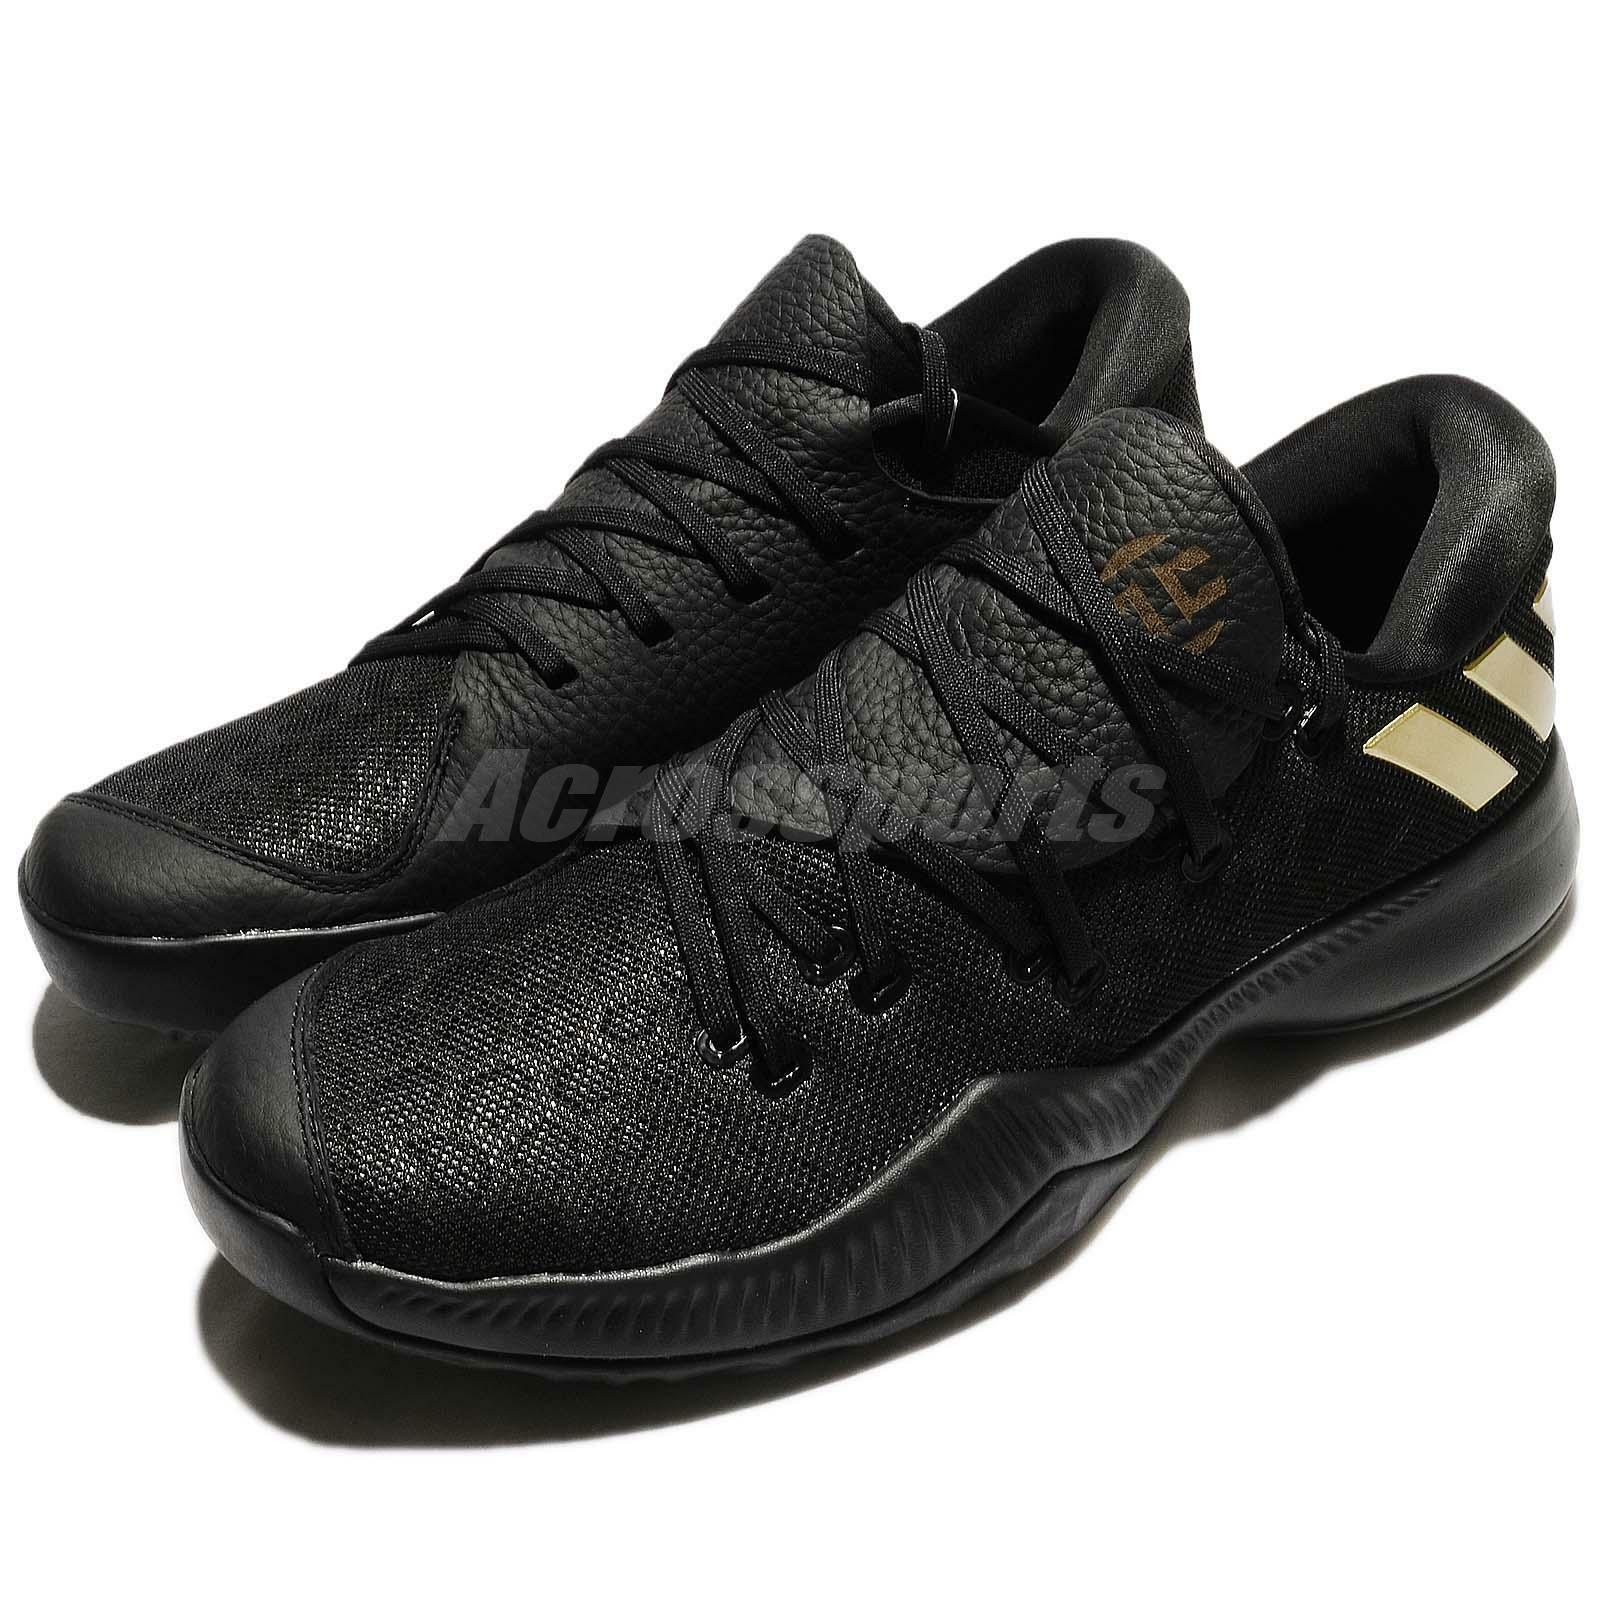 Adidas harden b   e james rimbalzi, oro nero ac7819 uomini scarpe da basket. | Bassi costi  | Sig/Sig Ra Scarpa